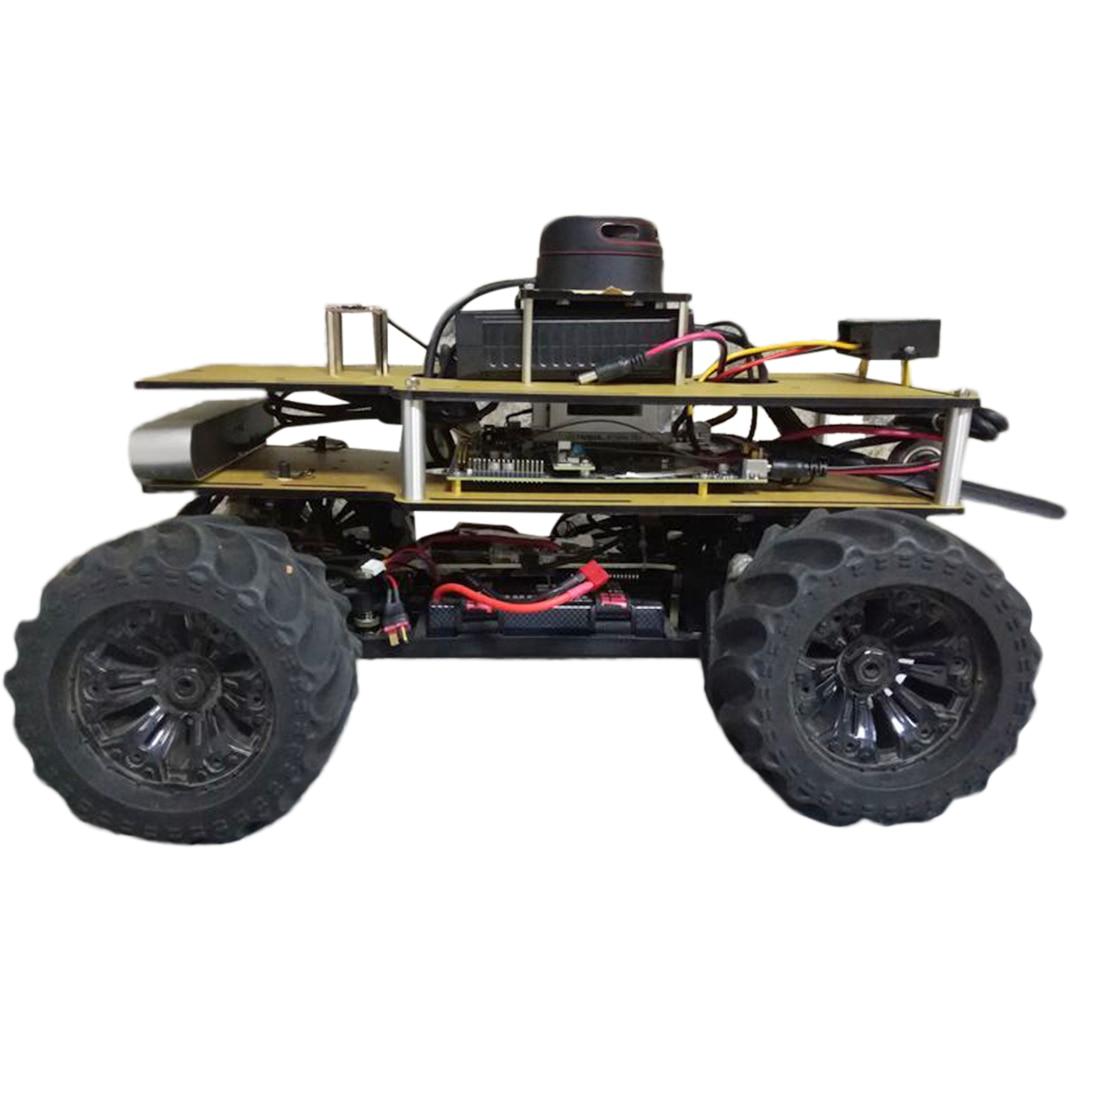 1/10 Programmable ROS Robot Ackerman Suspension Autopilot Ride Kit For Jetson TX2 - Outdoor Version